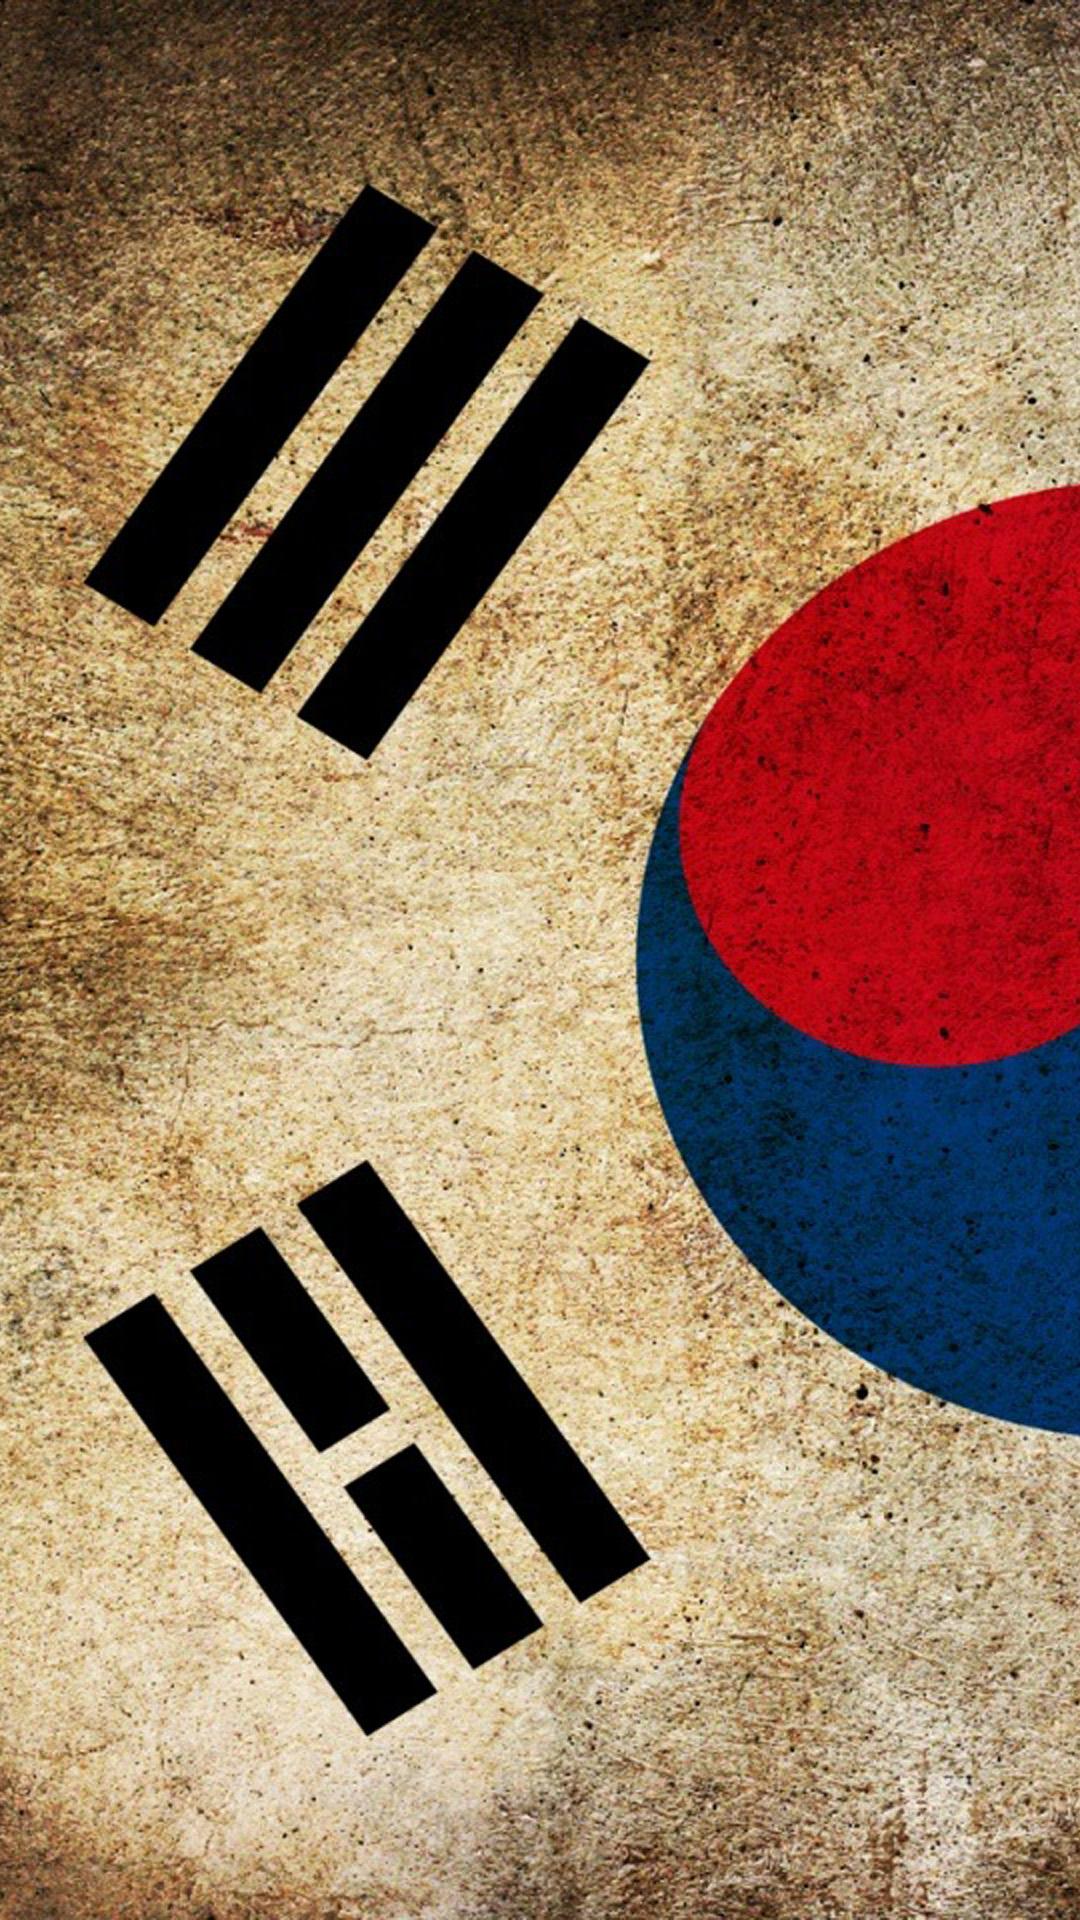 Wallpaper iphone korea - Flag South Korea Hd Wallpaper Iphone 6 Plus